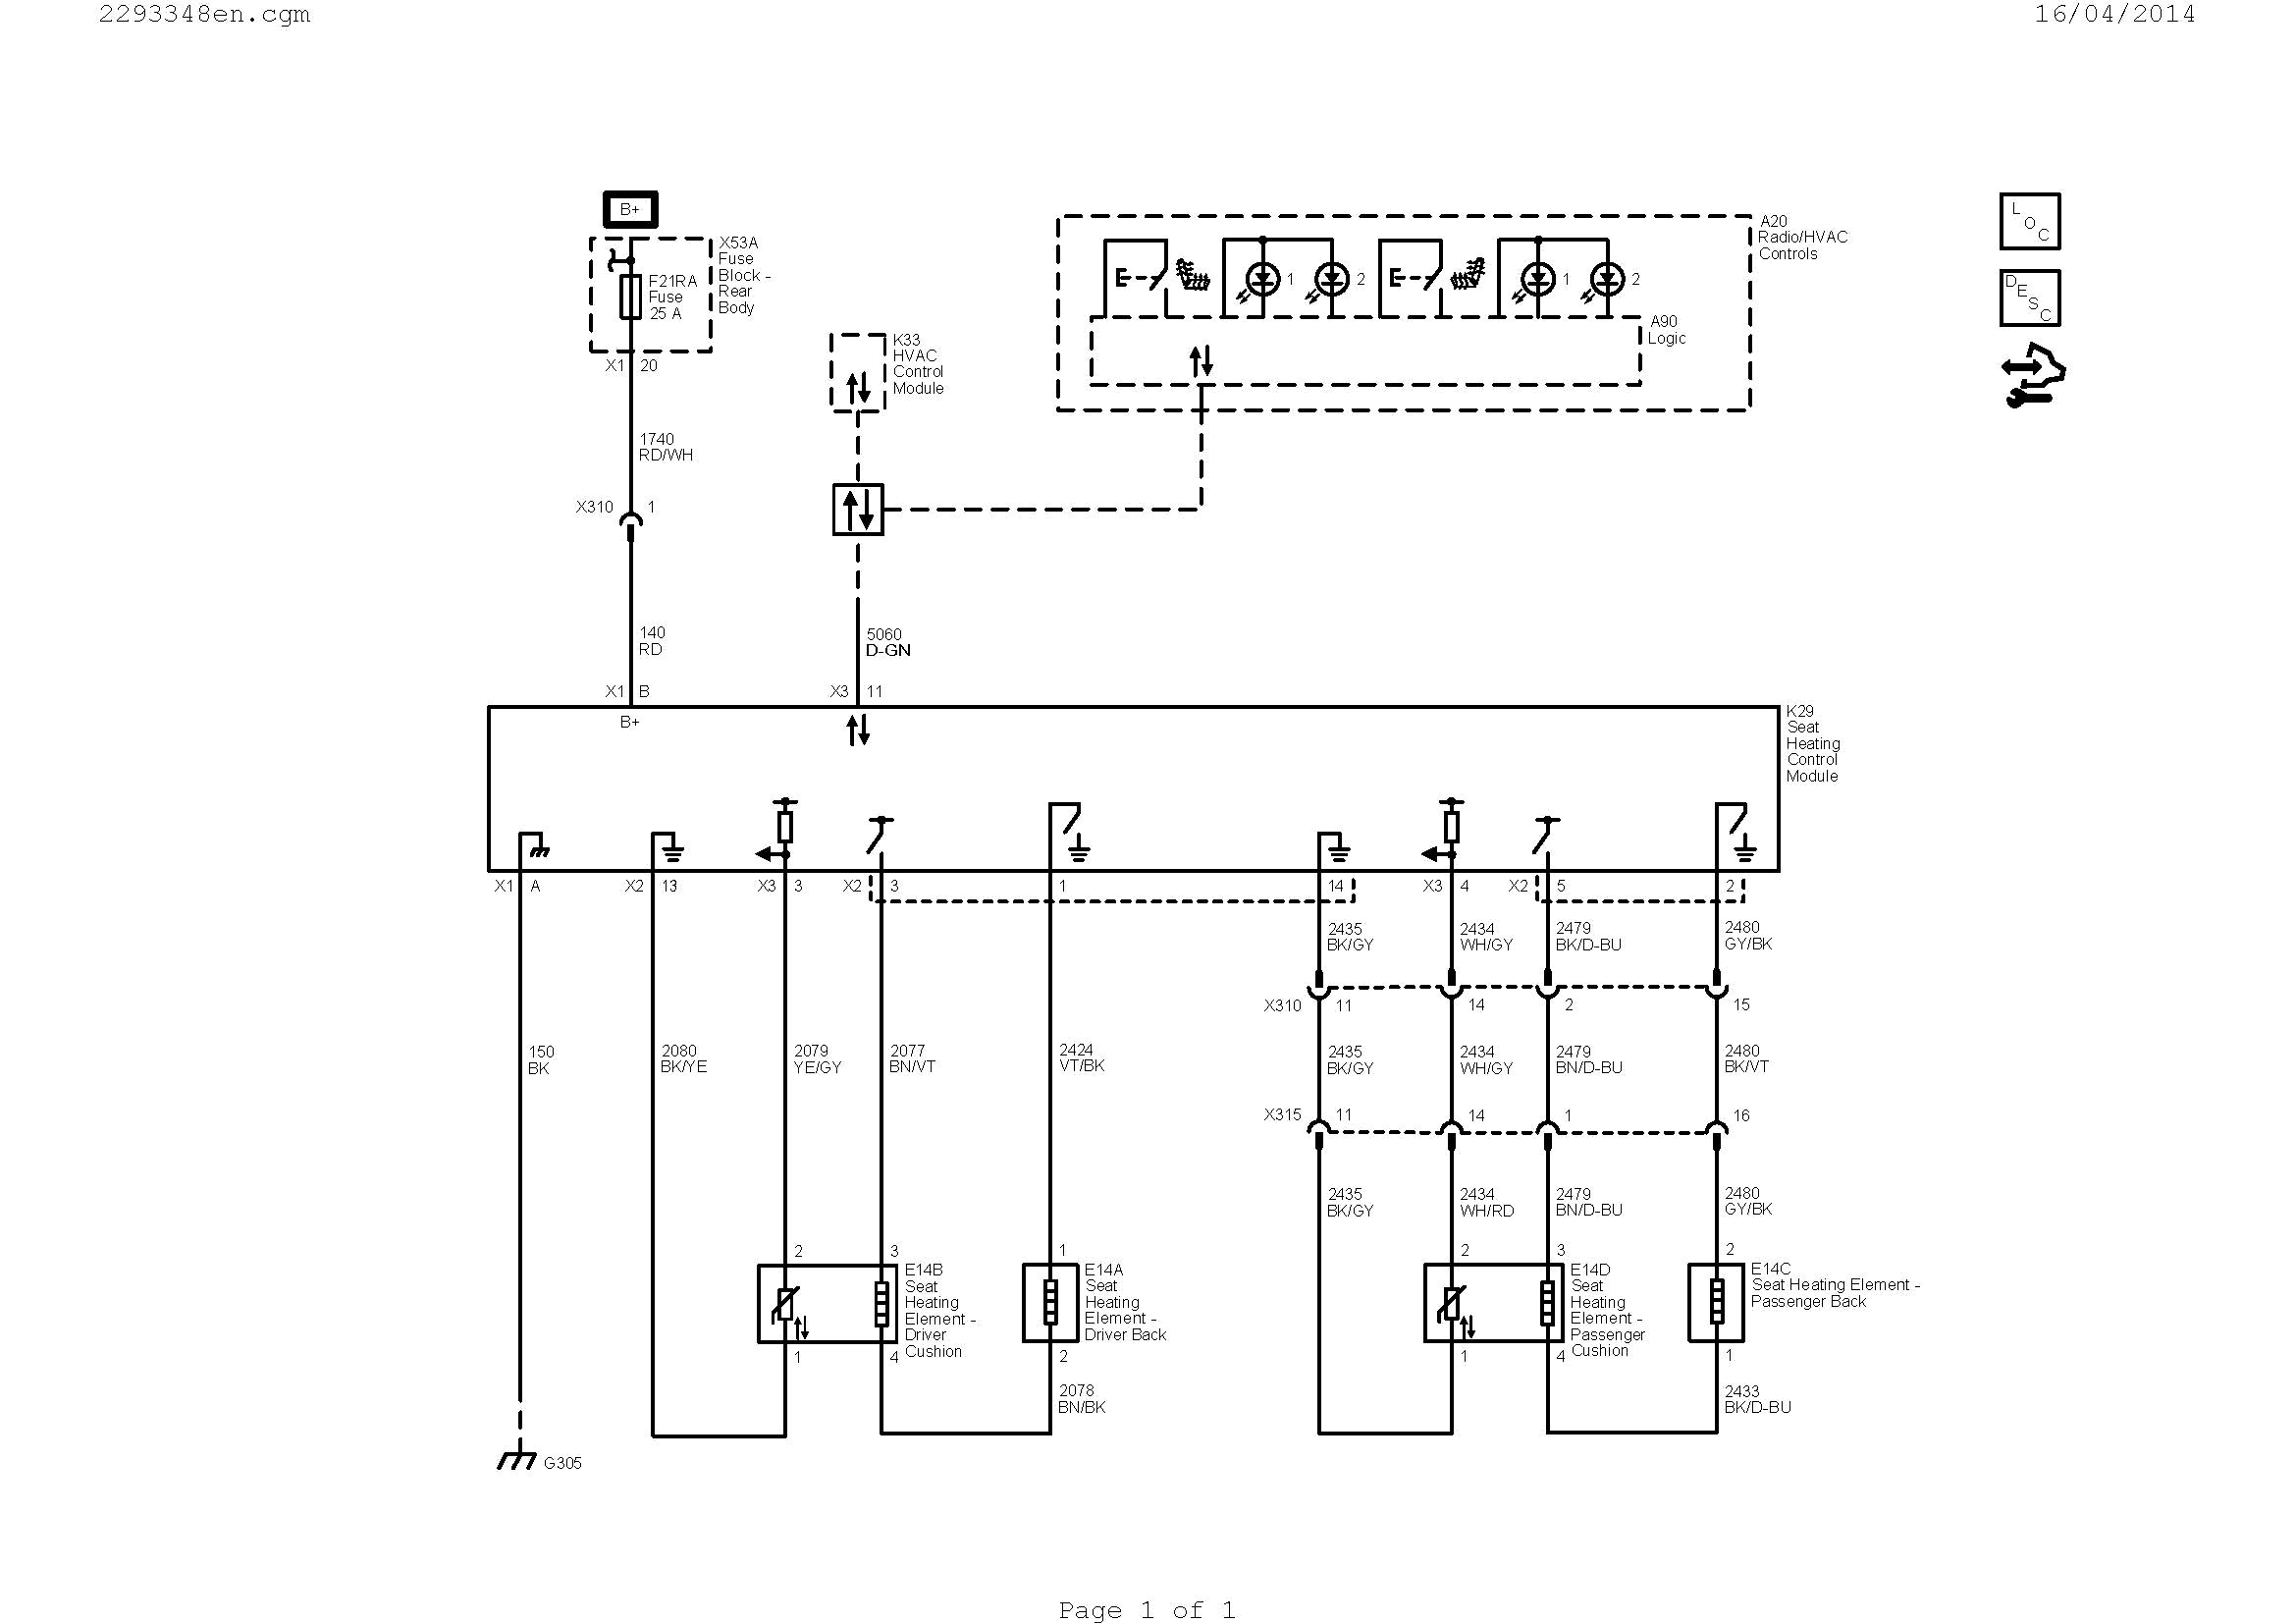 2001 ford windstar radio wiring diagram of ups engine th q taurus